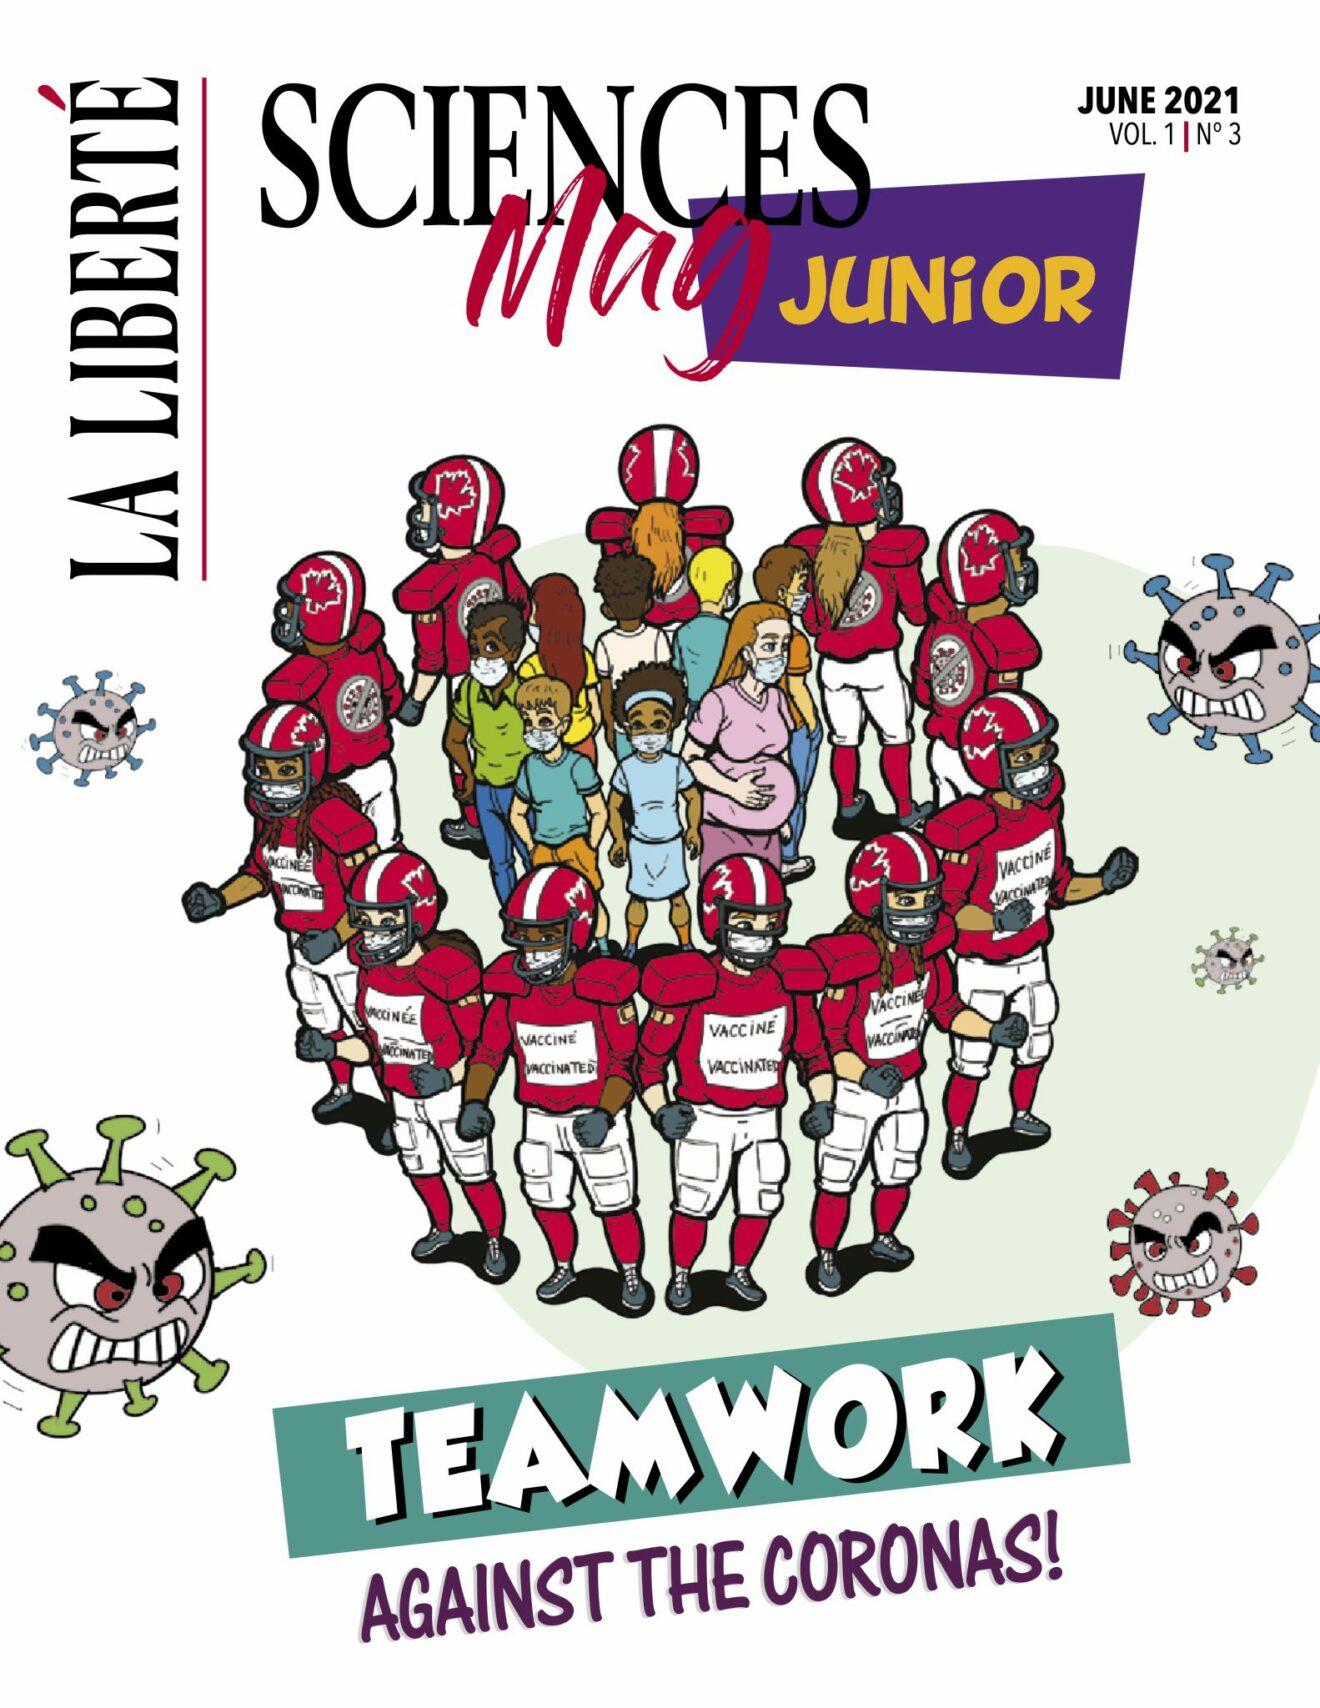 La Liberté publishes third edition of Sciences Mag Junior